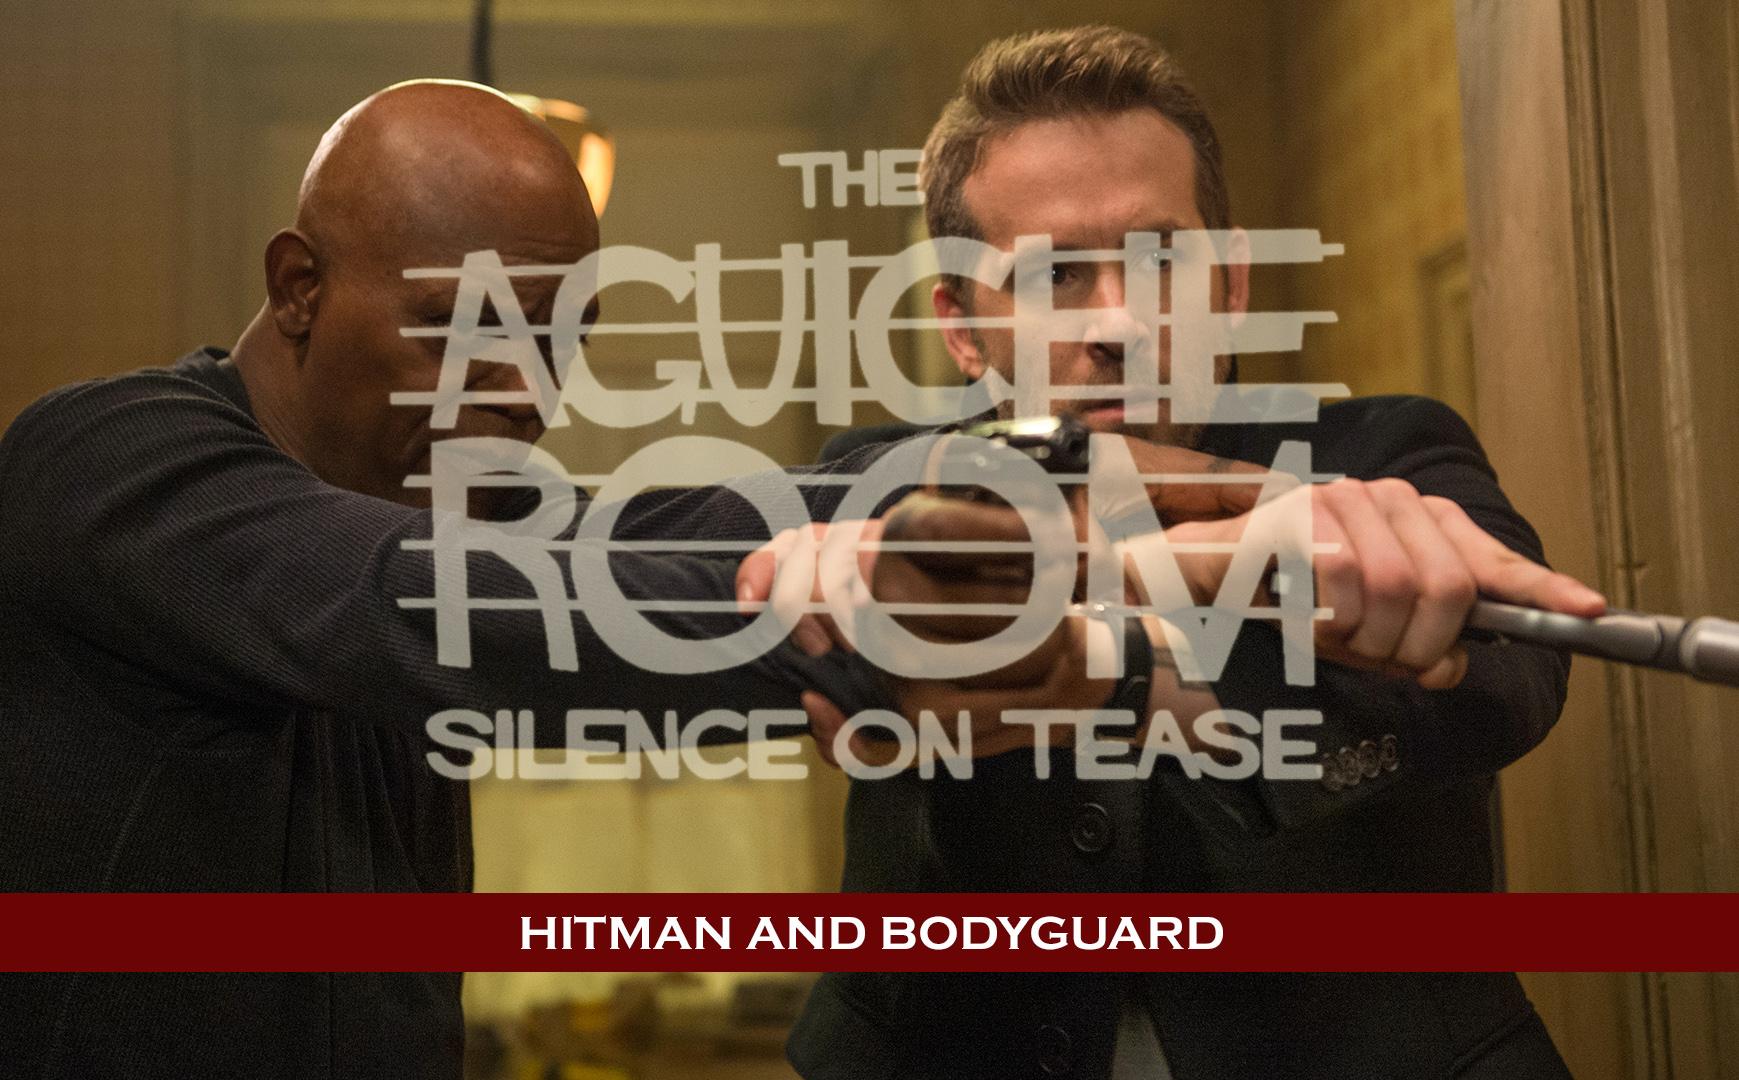 #AguicheRoom Hitman & Bodyguard